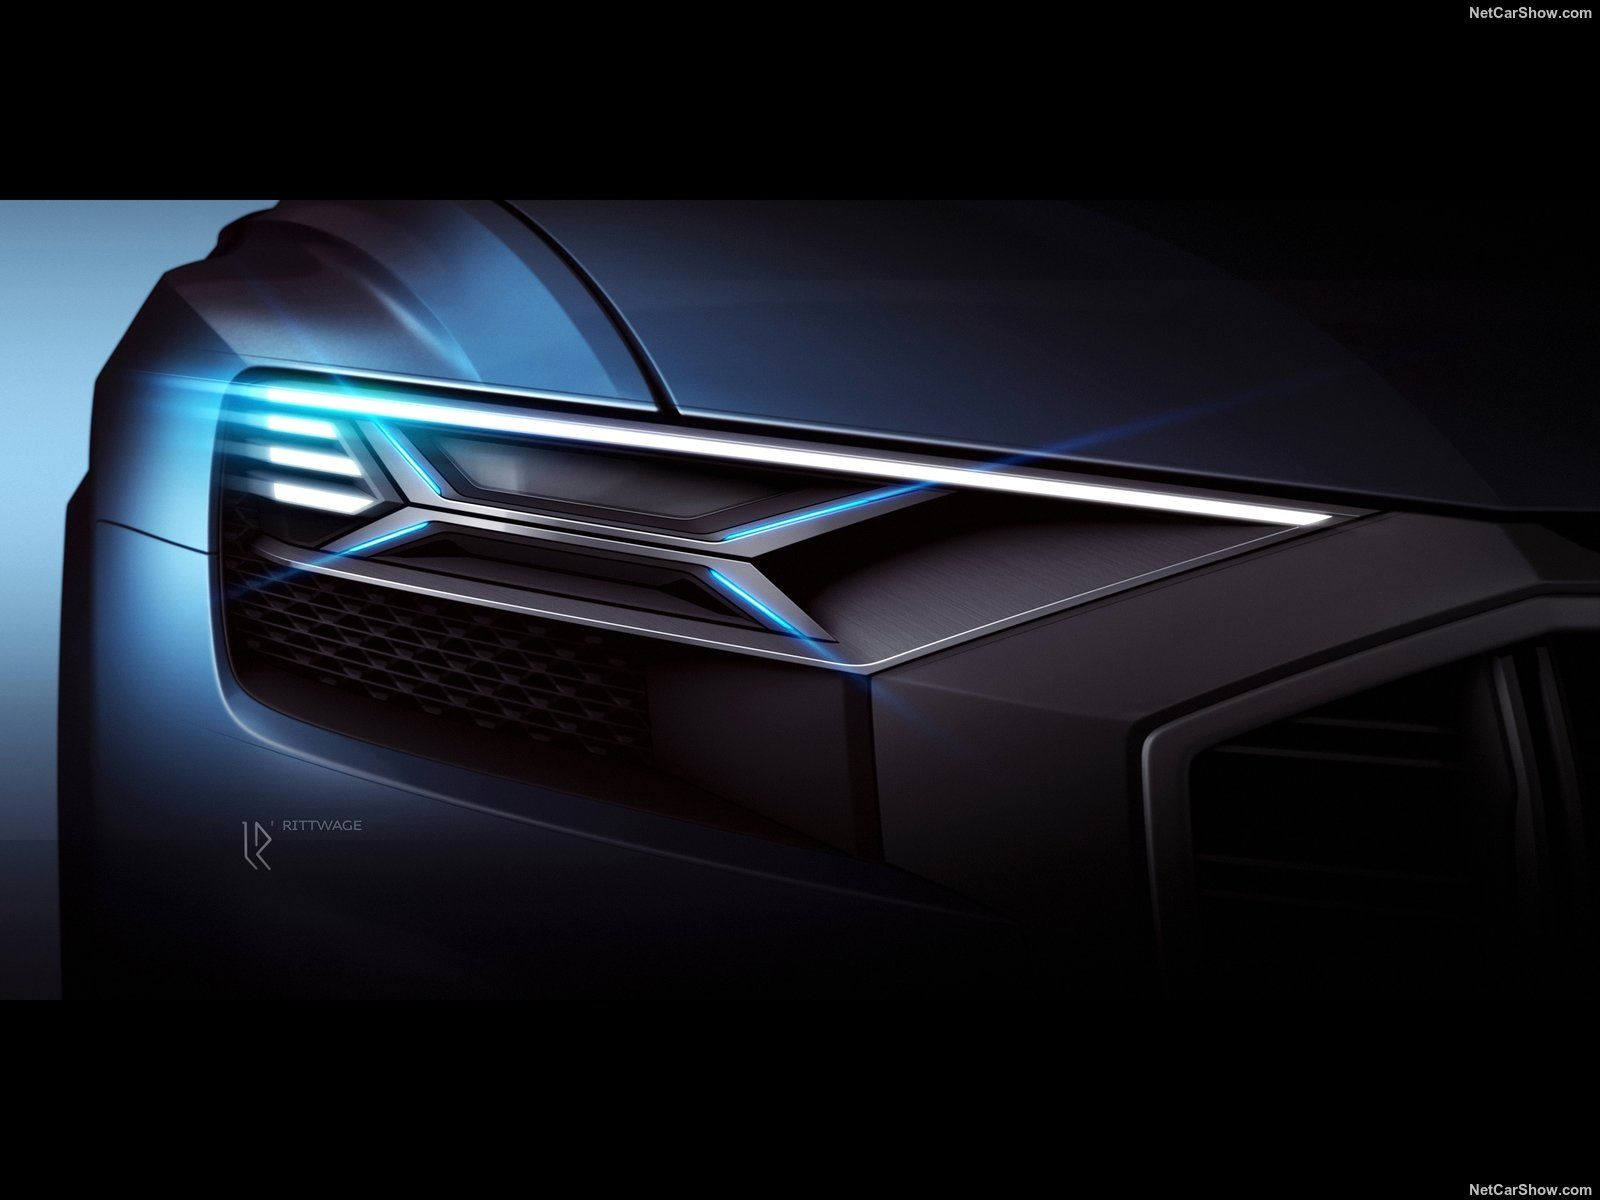 Pin By L Y On L Headlamp Design Car Headlights Automotive Design